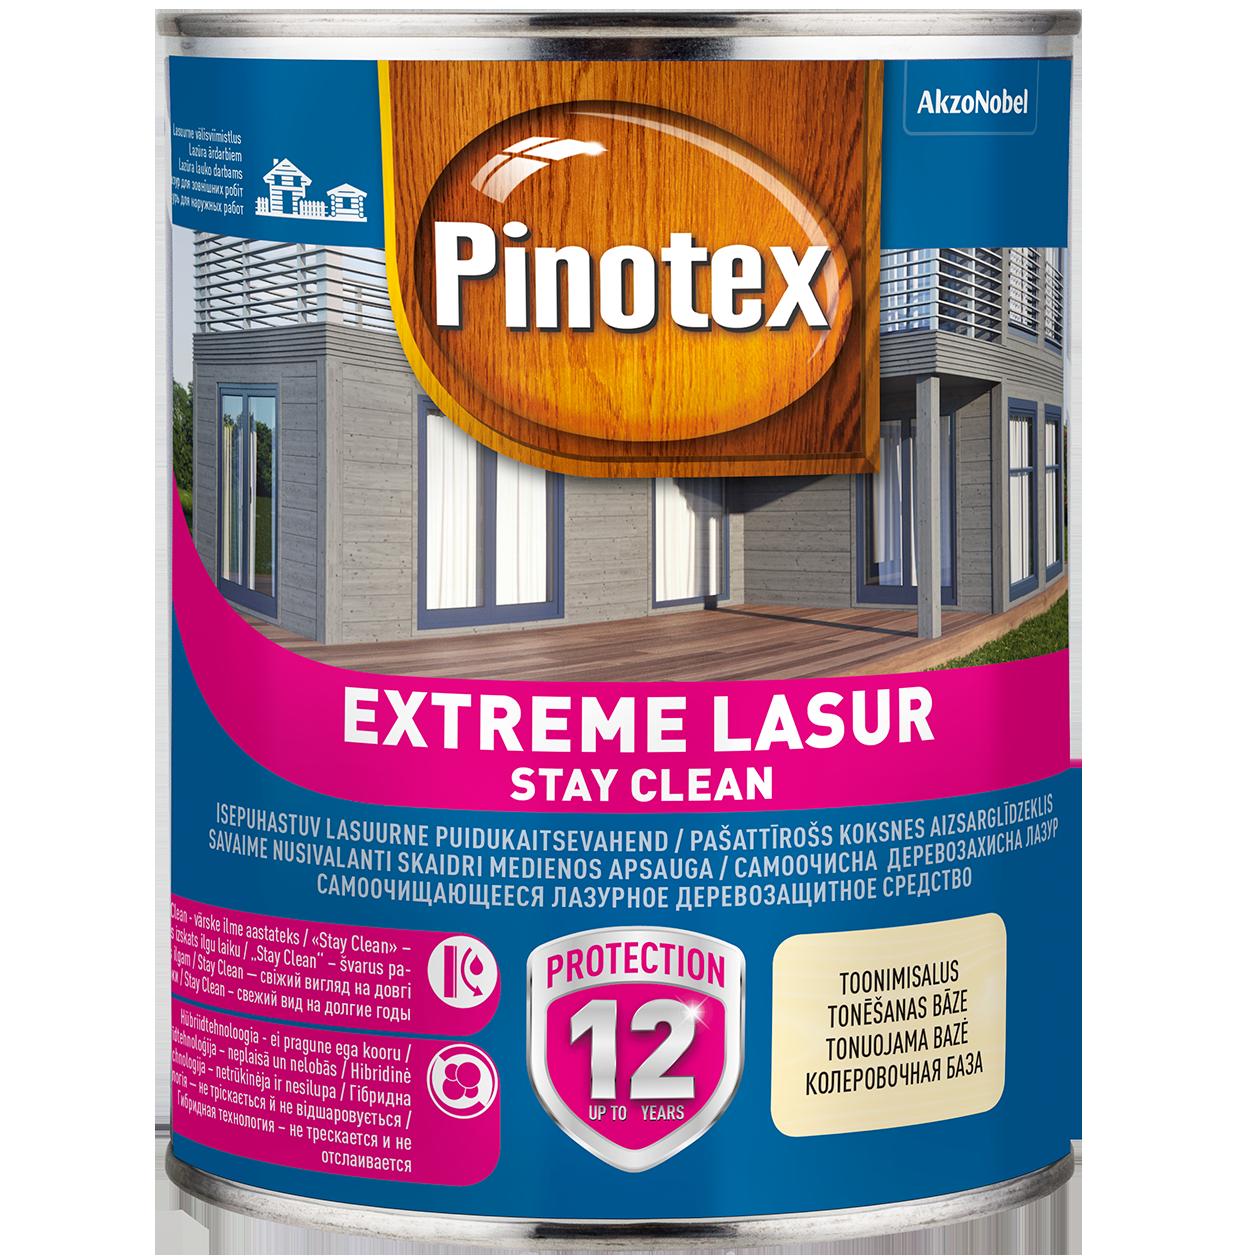 Pinotex Extreme Lasur